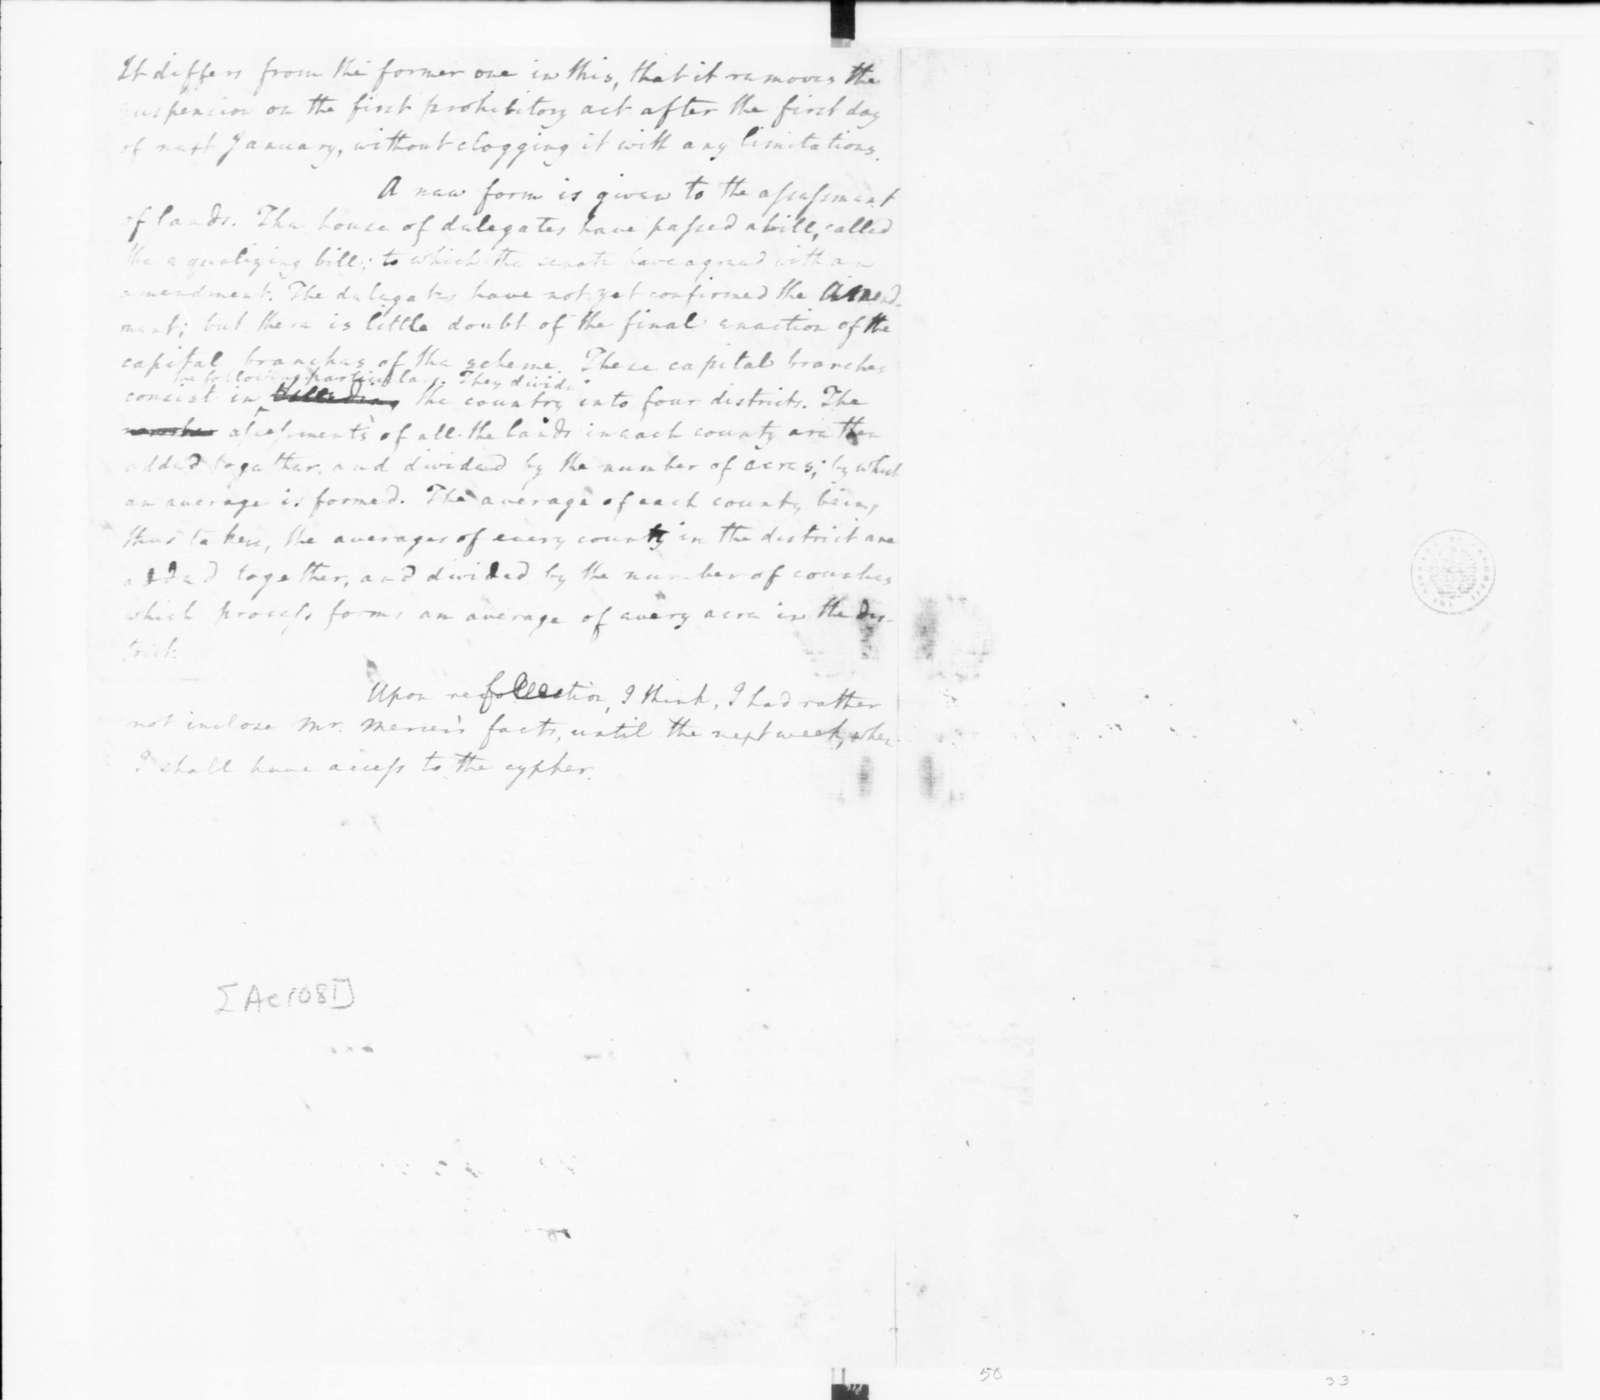 Edmund Randolph to James Madison, December 20, 1782.